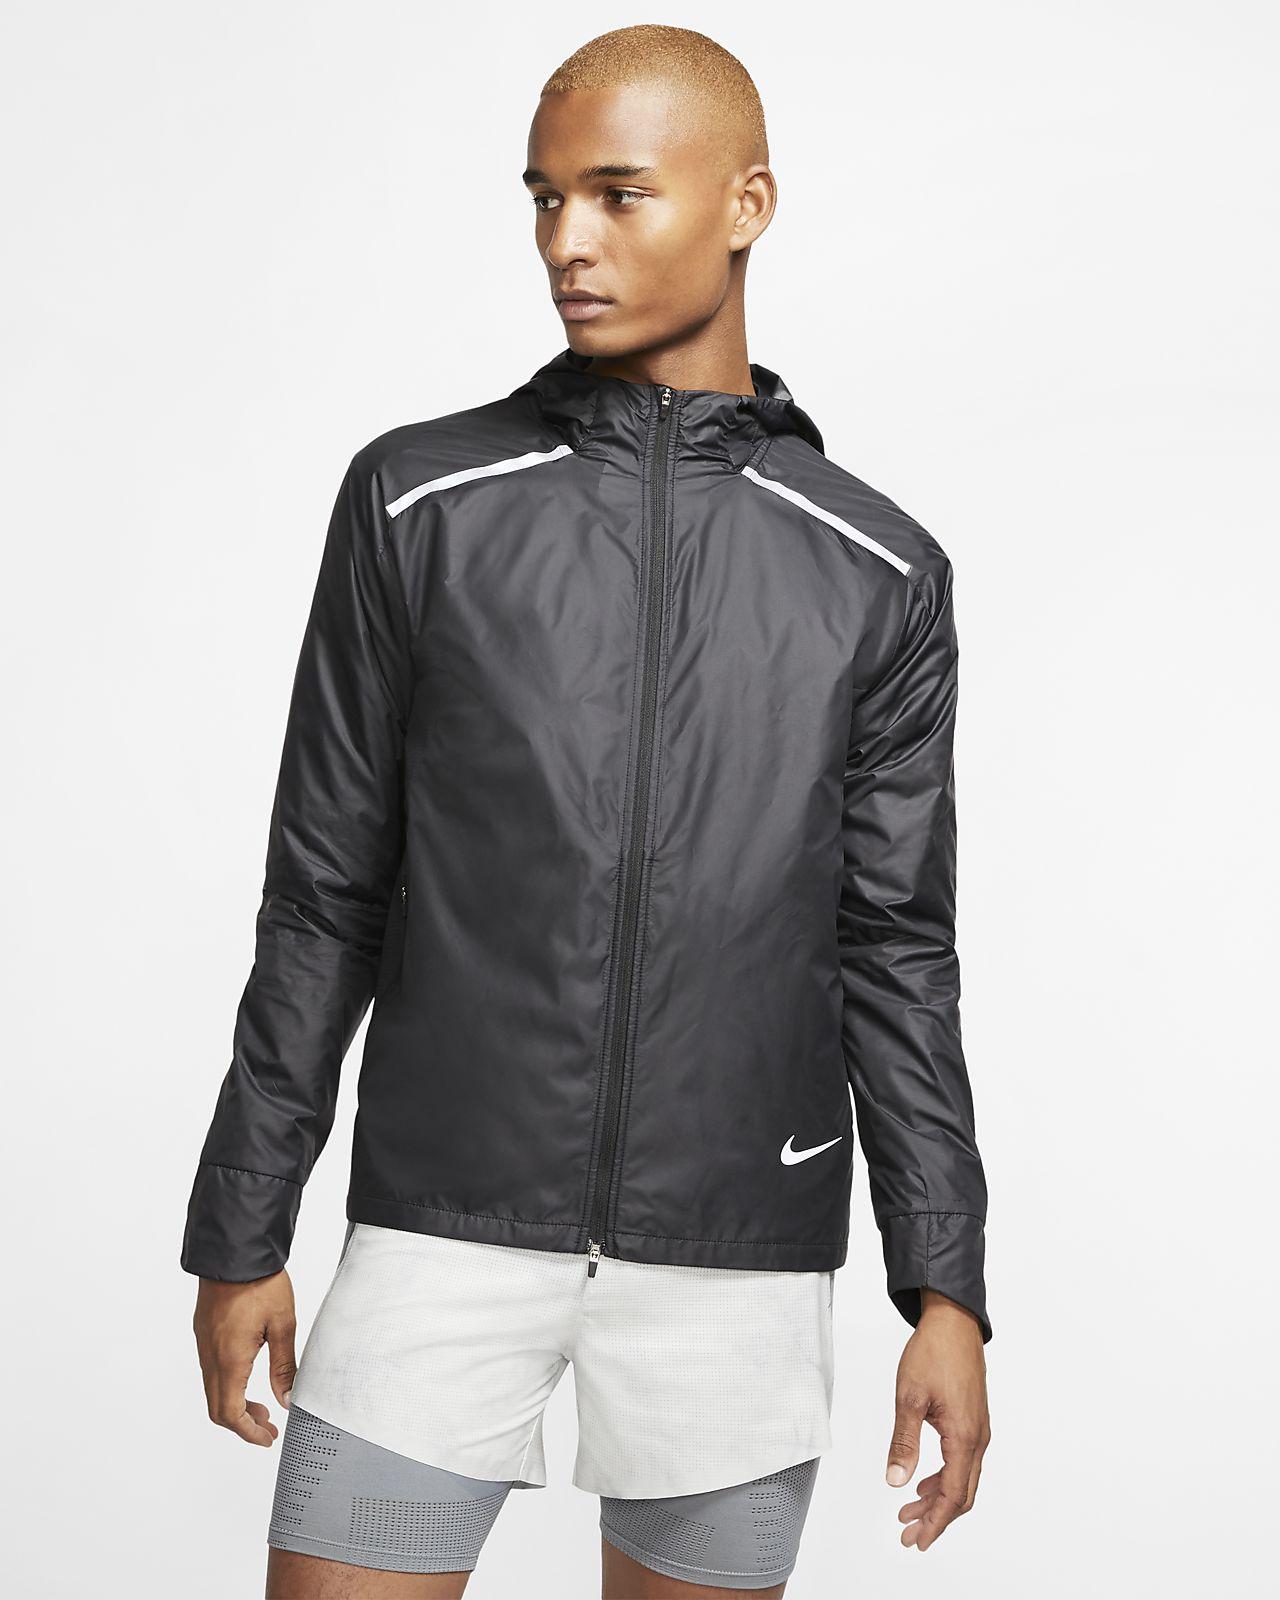 Nike Repel Men's Hooded Running Jacket